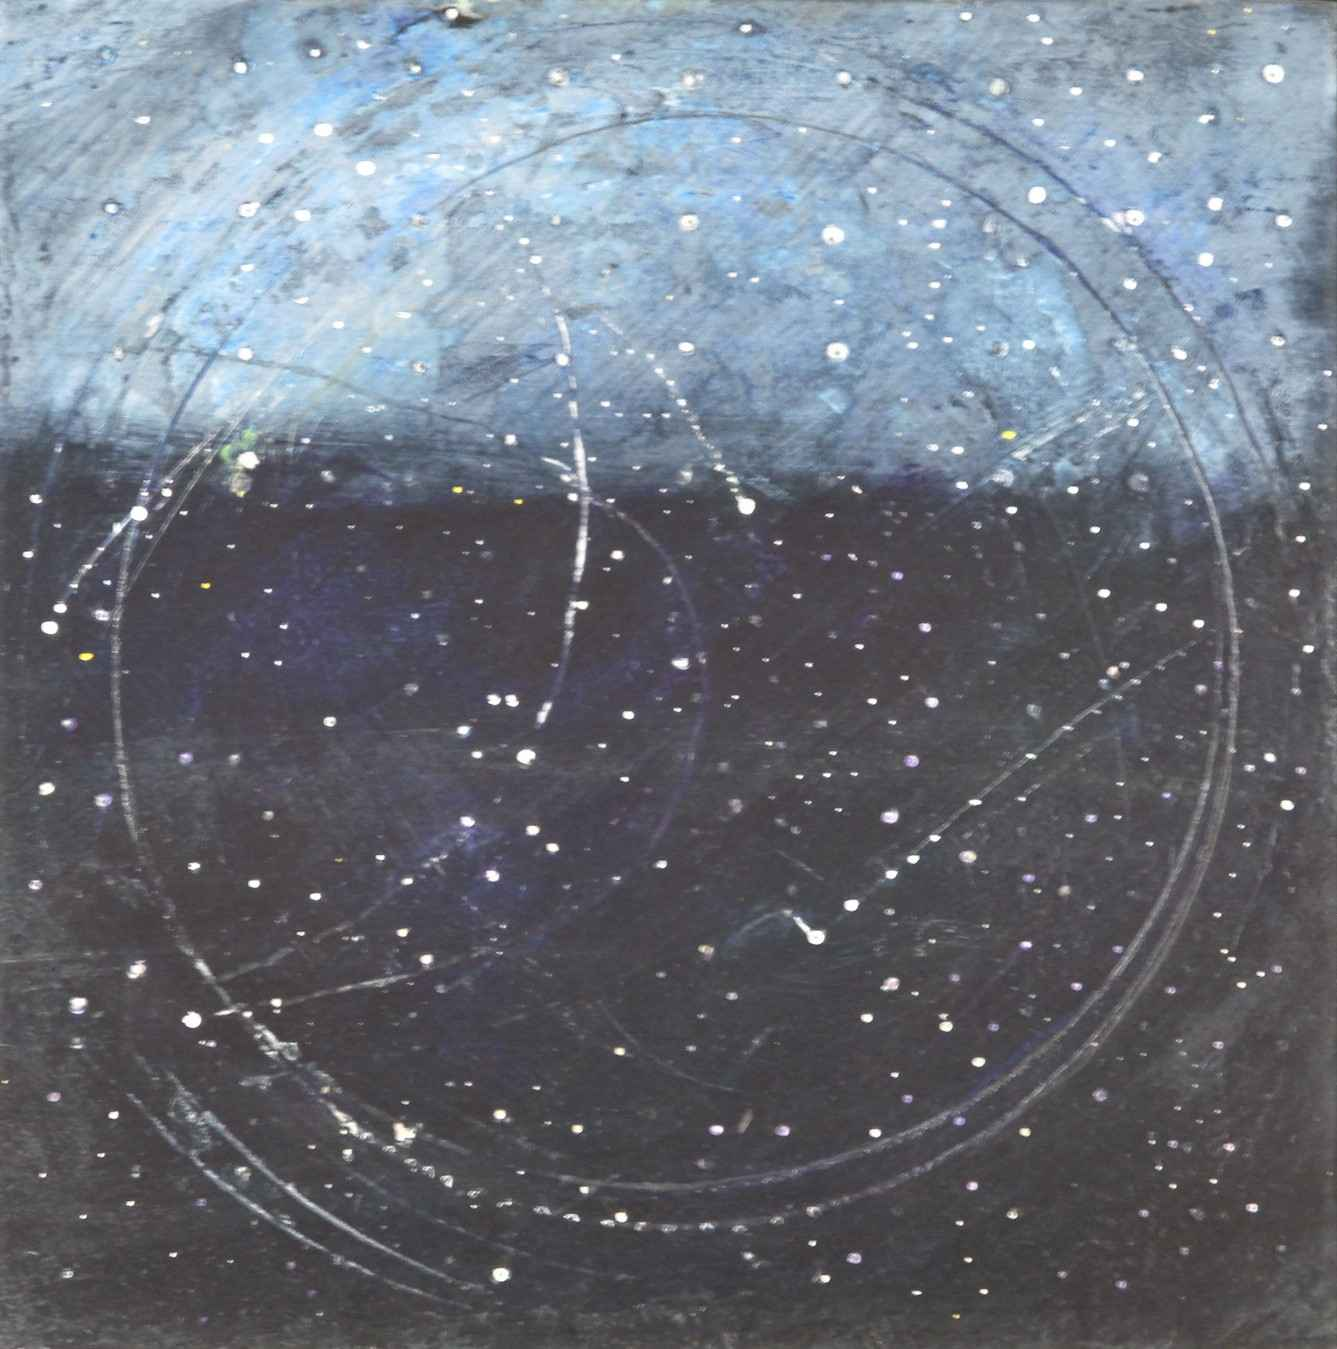 Universes Painting by  Deanne Belinoff - Masterpiece Online